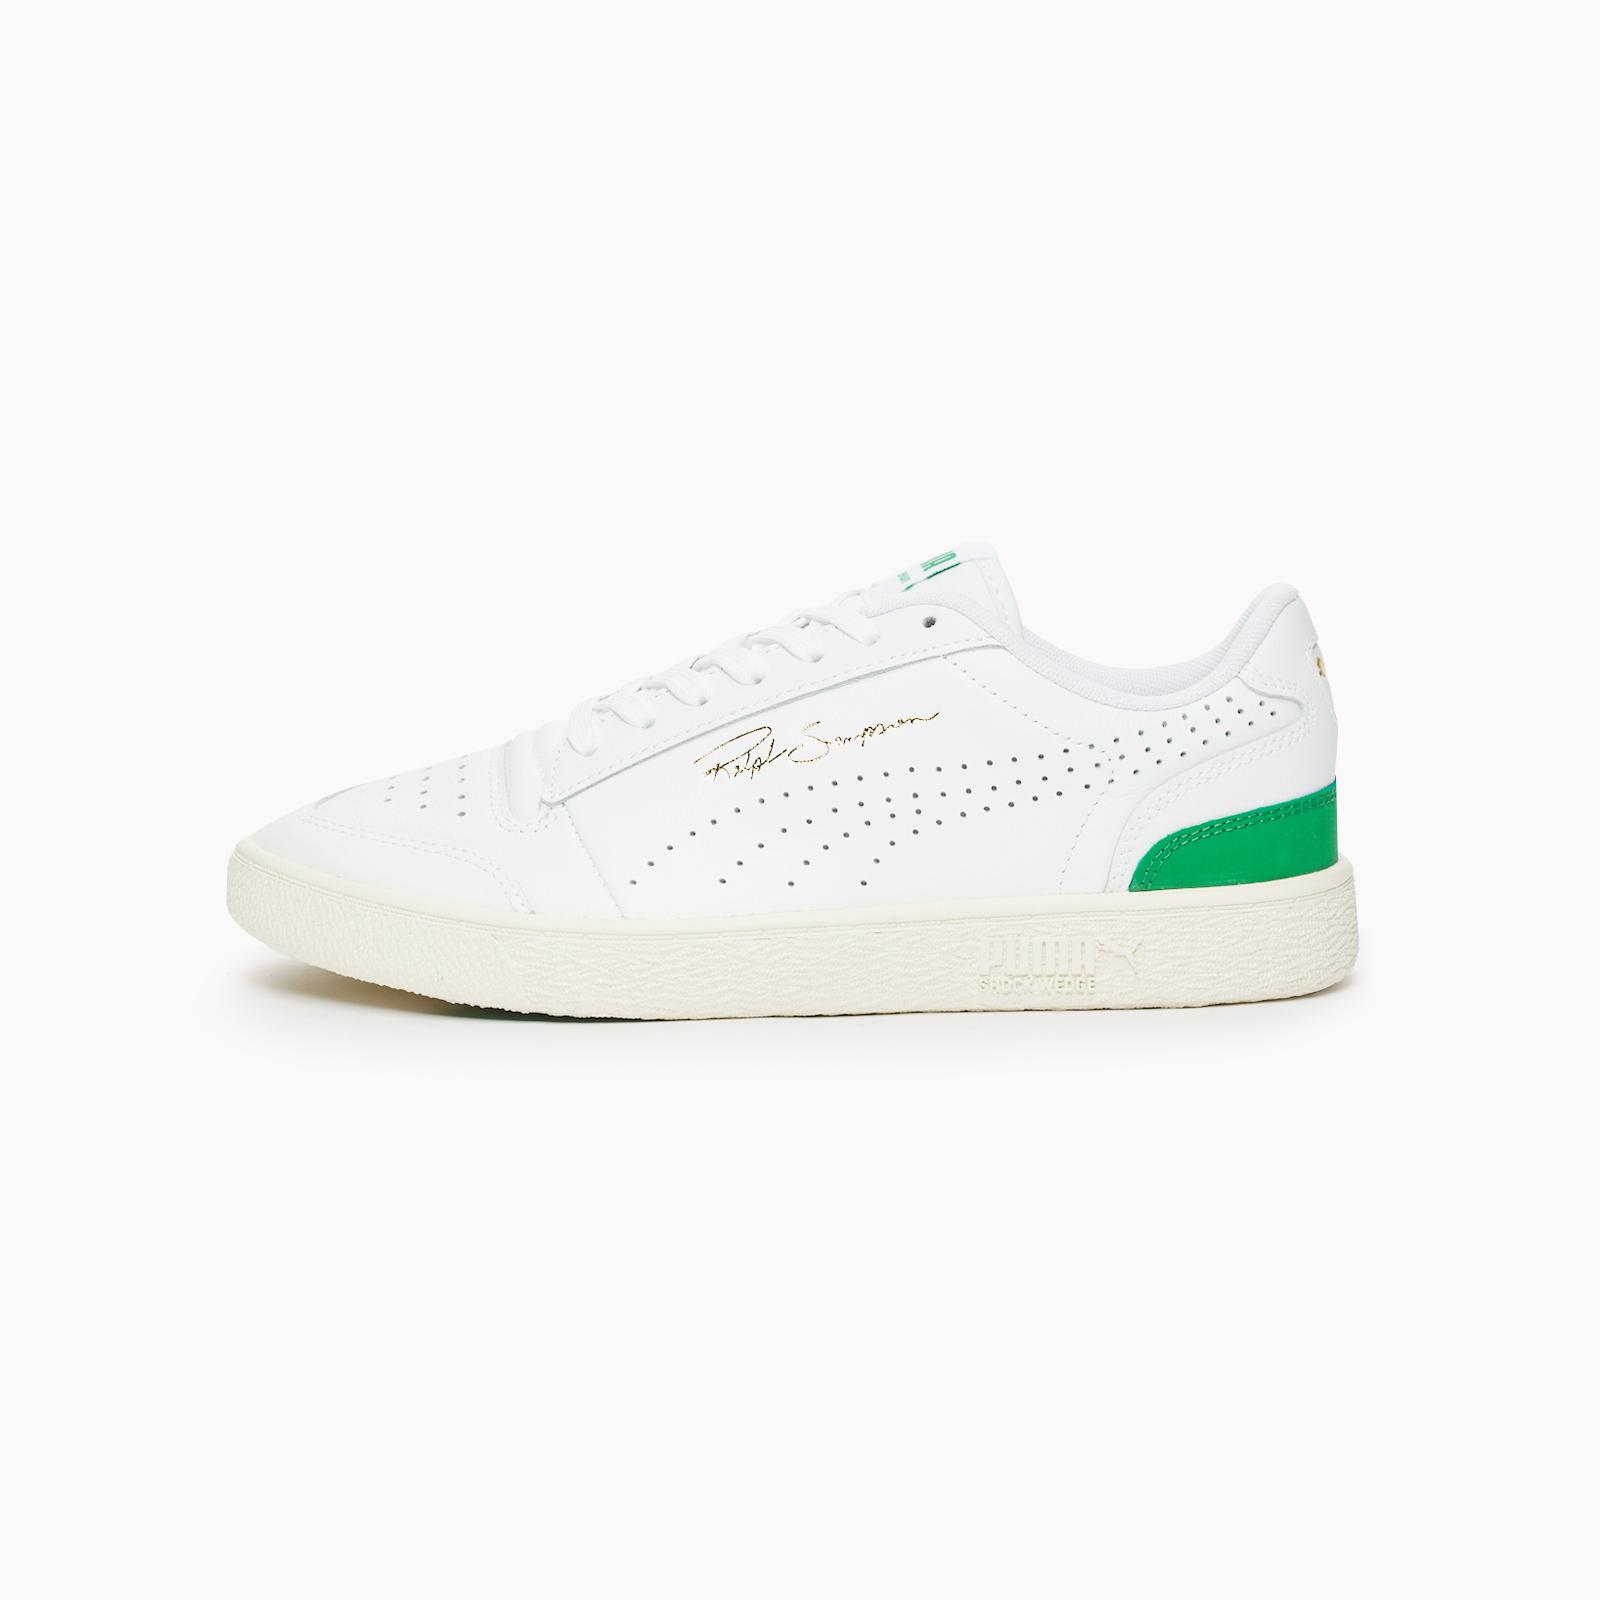 Puma Ralph Sampson Lo Perf Soft - 372395-01 - SNS | sneakers ...